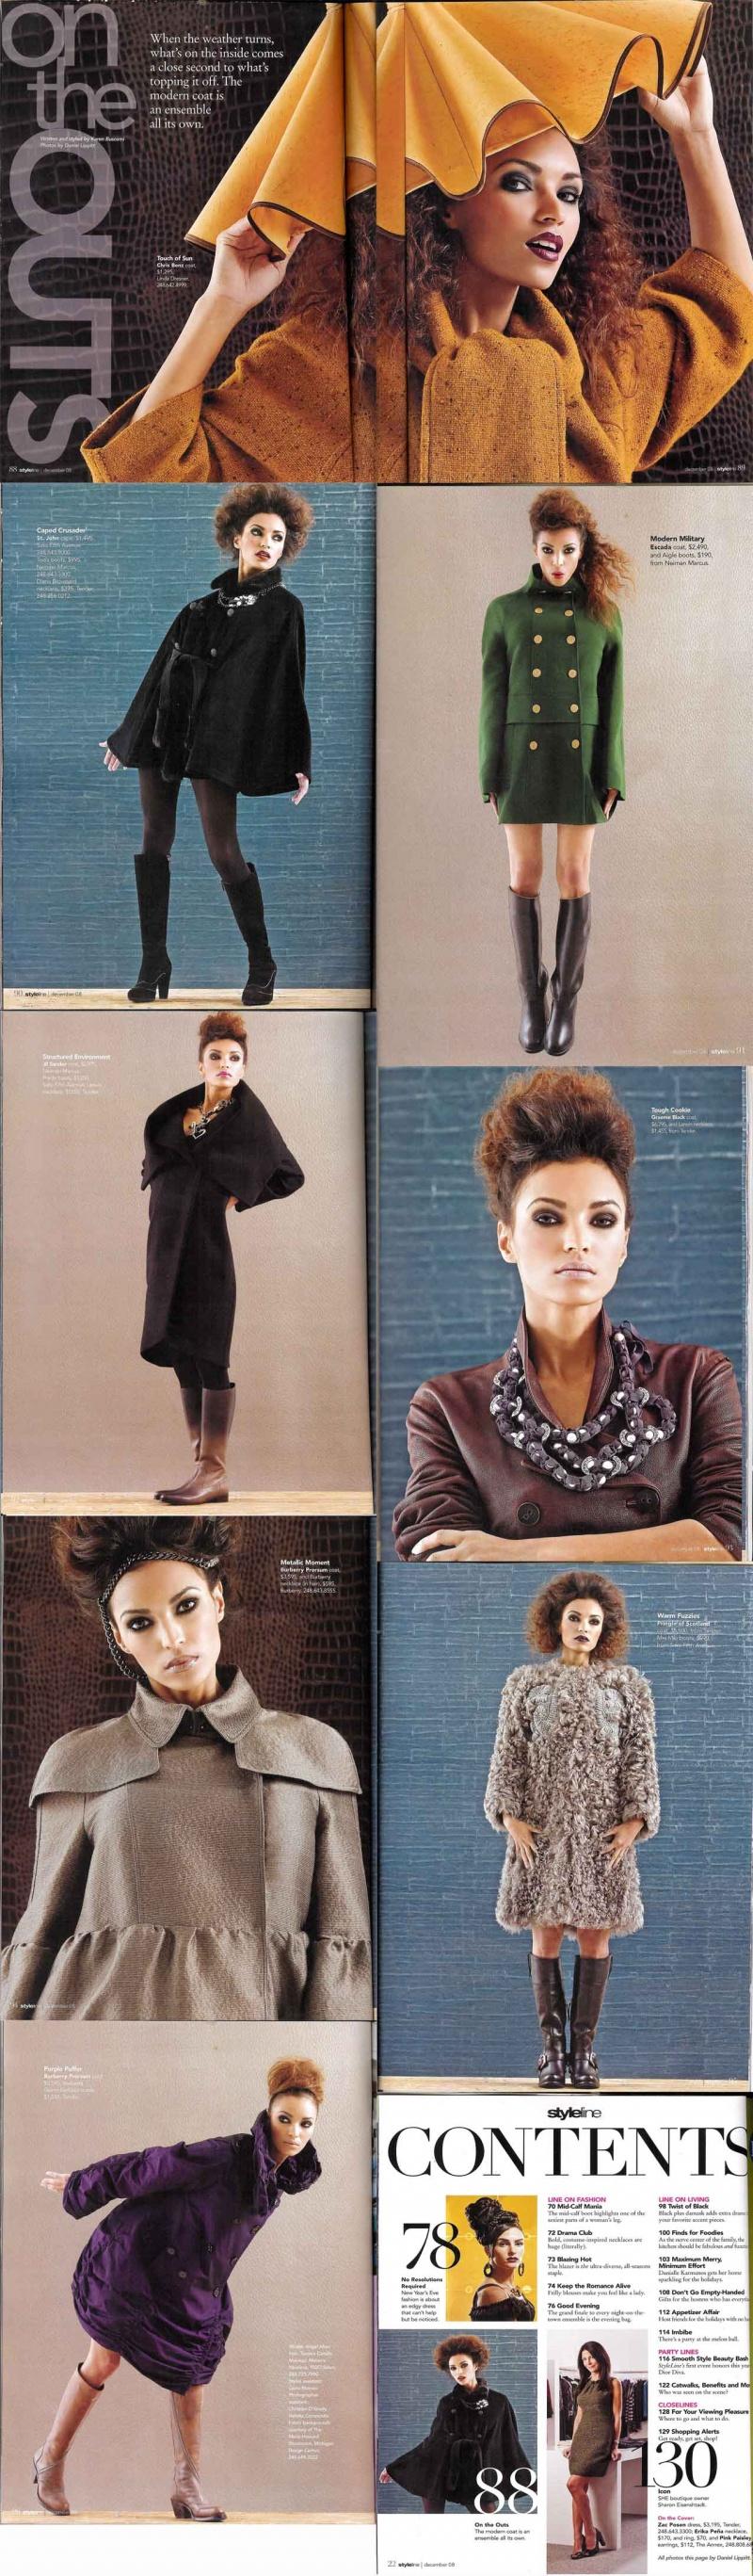 Dec 01, 2008 Dan Lippitt Styeline Magazine Layout Dec 2008